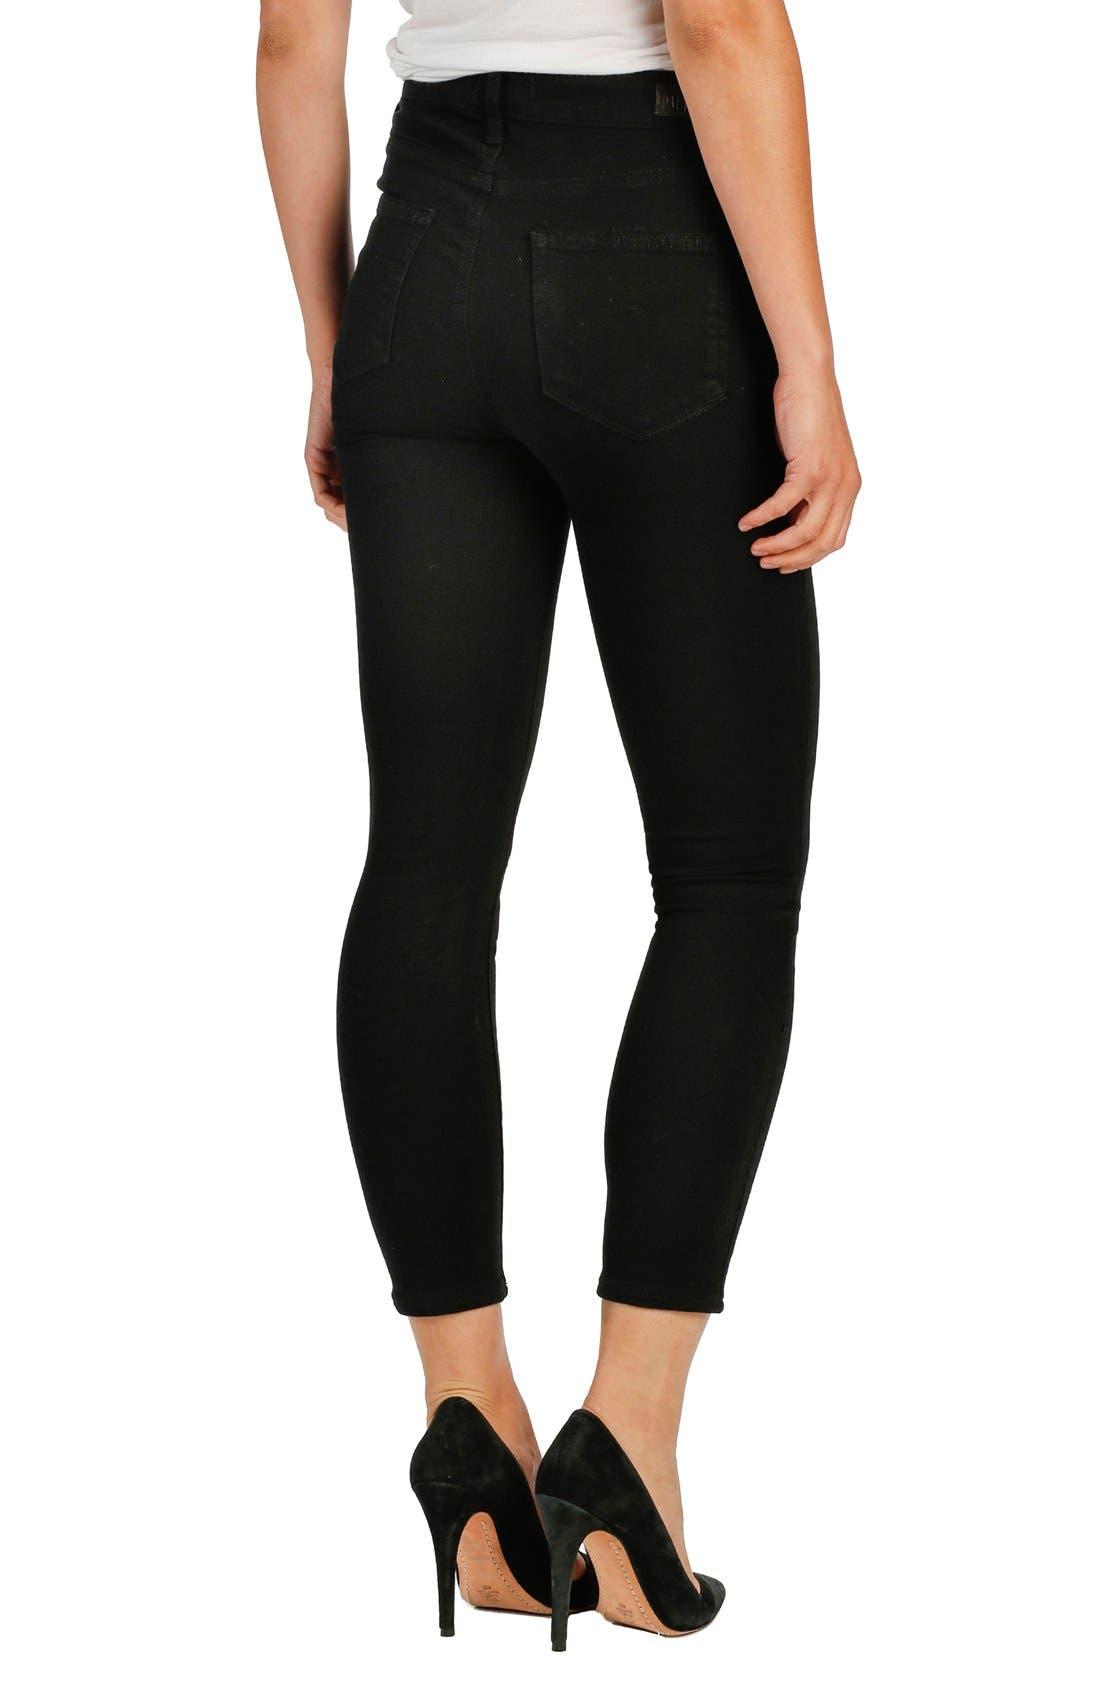 Alternate Image 2  - PAIGE Transcend - Margot High Waist Crop Ultra Skinny Jeans (Black Shadow)